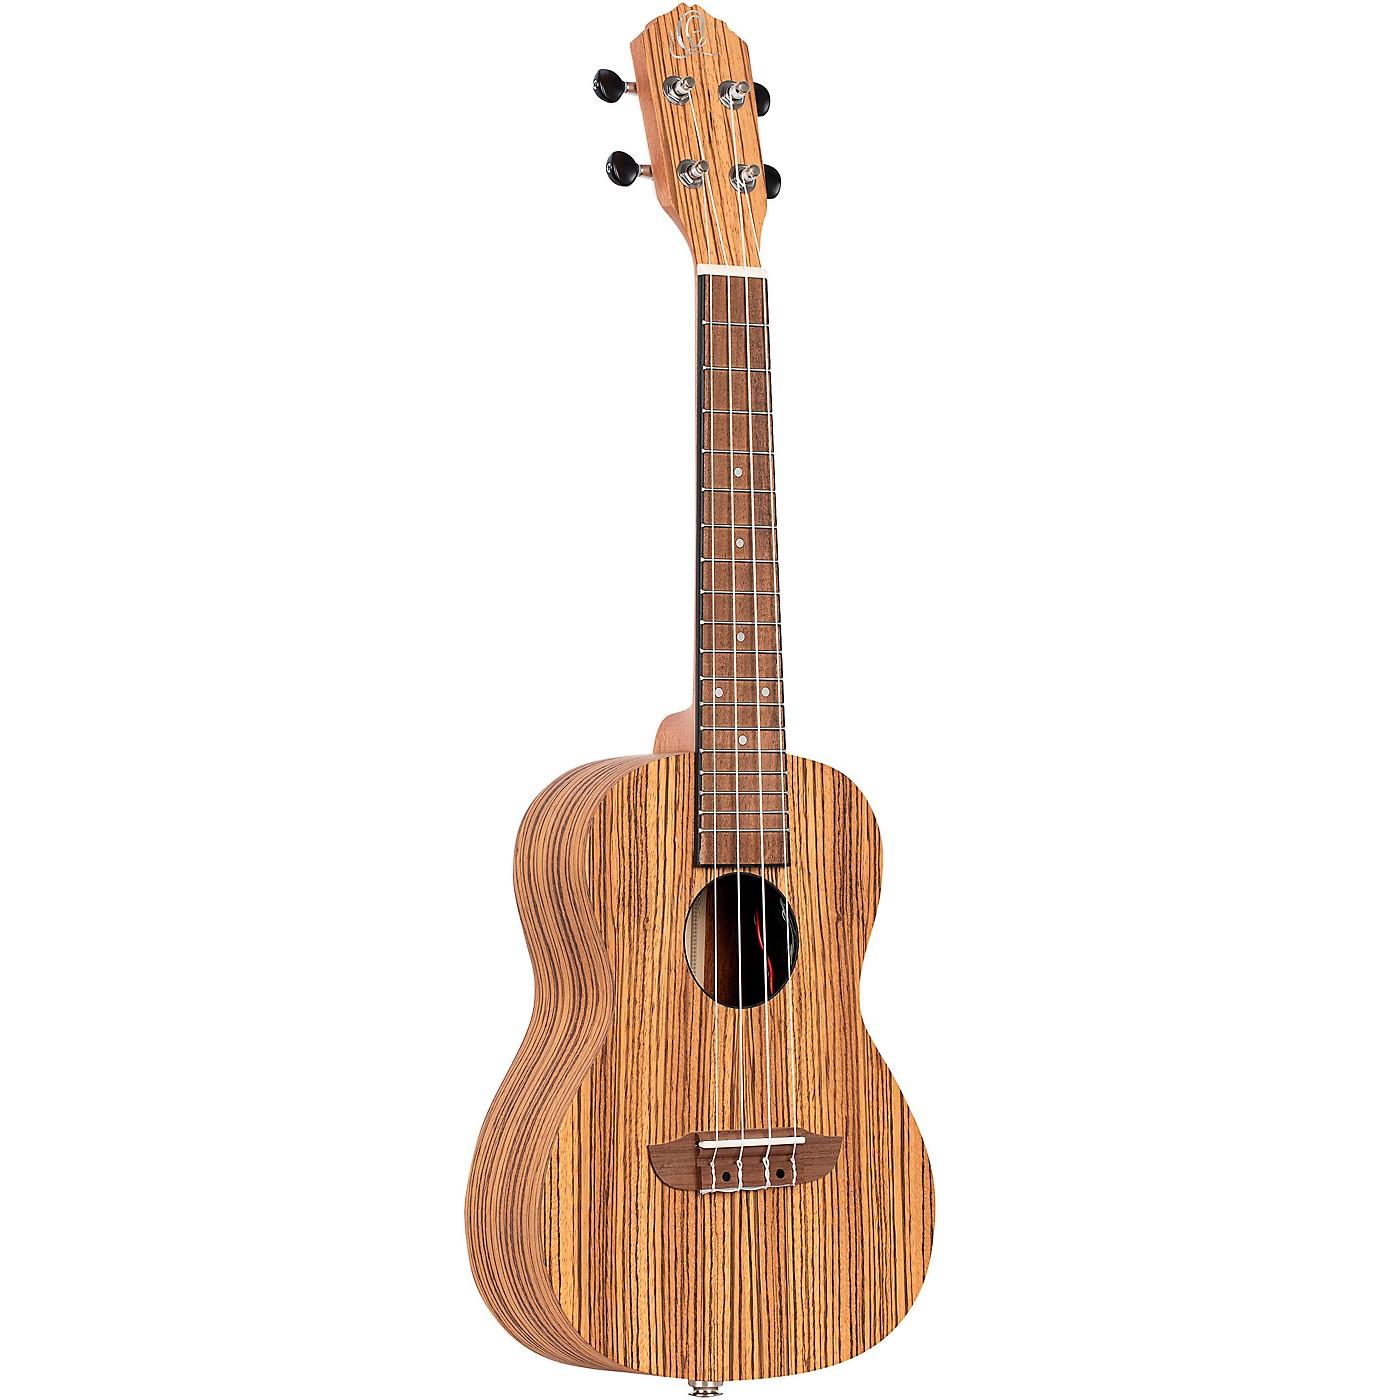 Ortega Timber Series RFU11ZE-L Left-Handed Acoustic Electric Concert Ukulele thumbnail